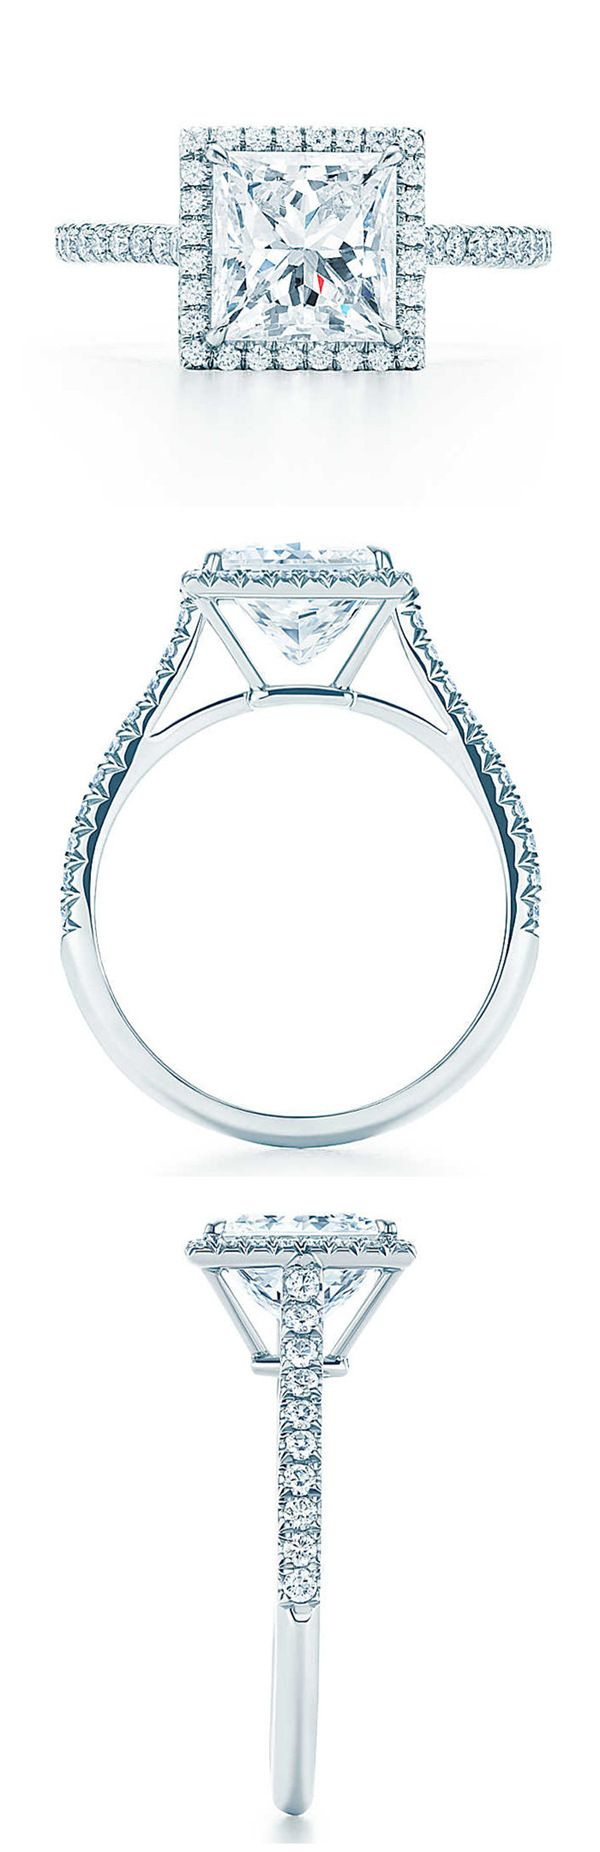 Tiffany princess cut halo wedding engagement rings